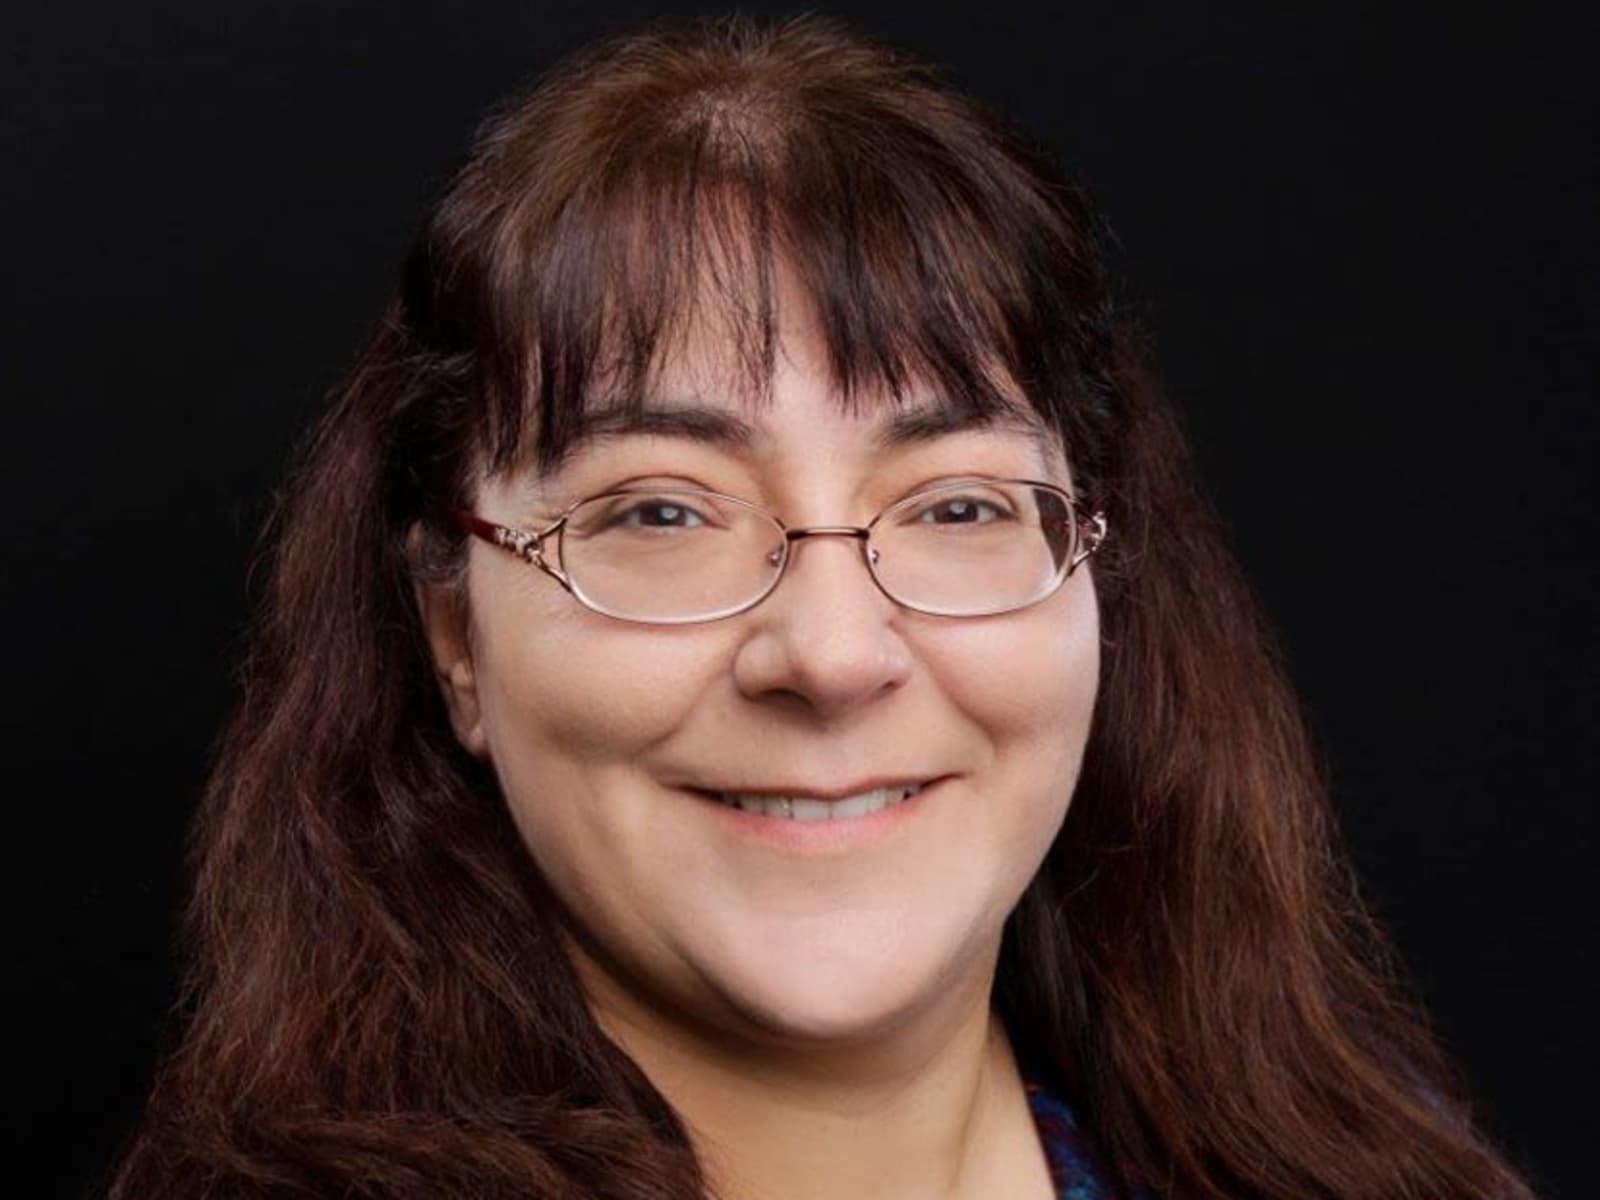 Laura from Portland, Oregon, United States